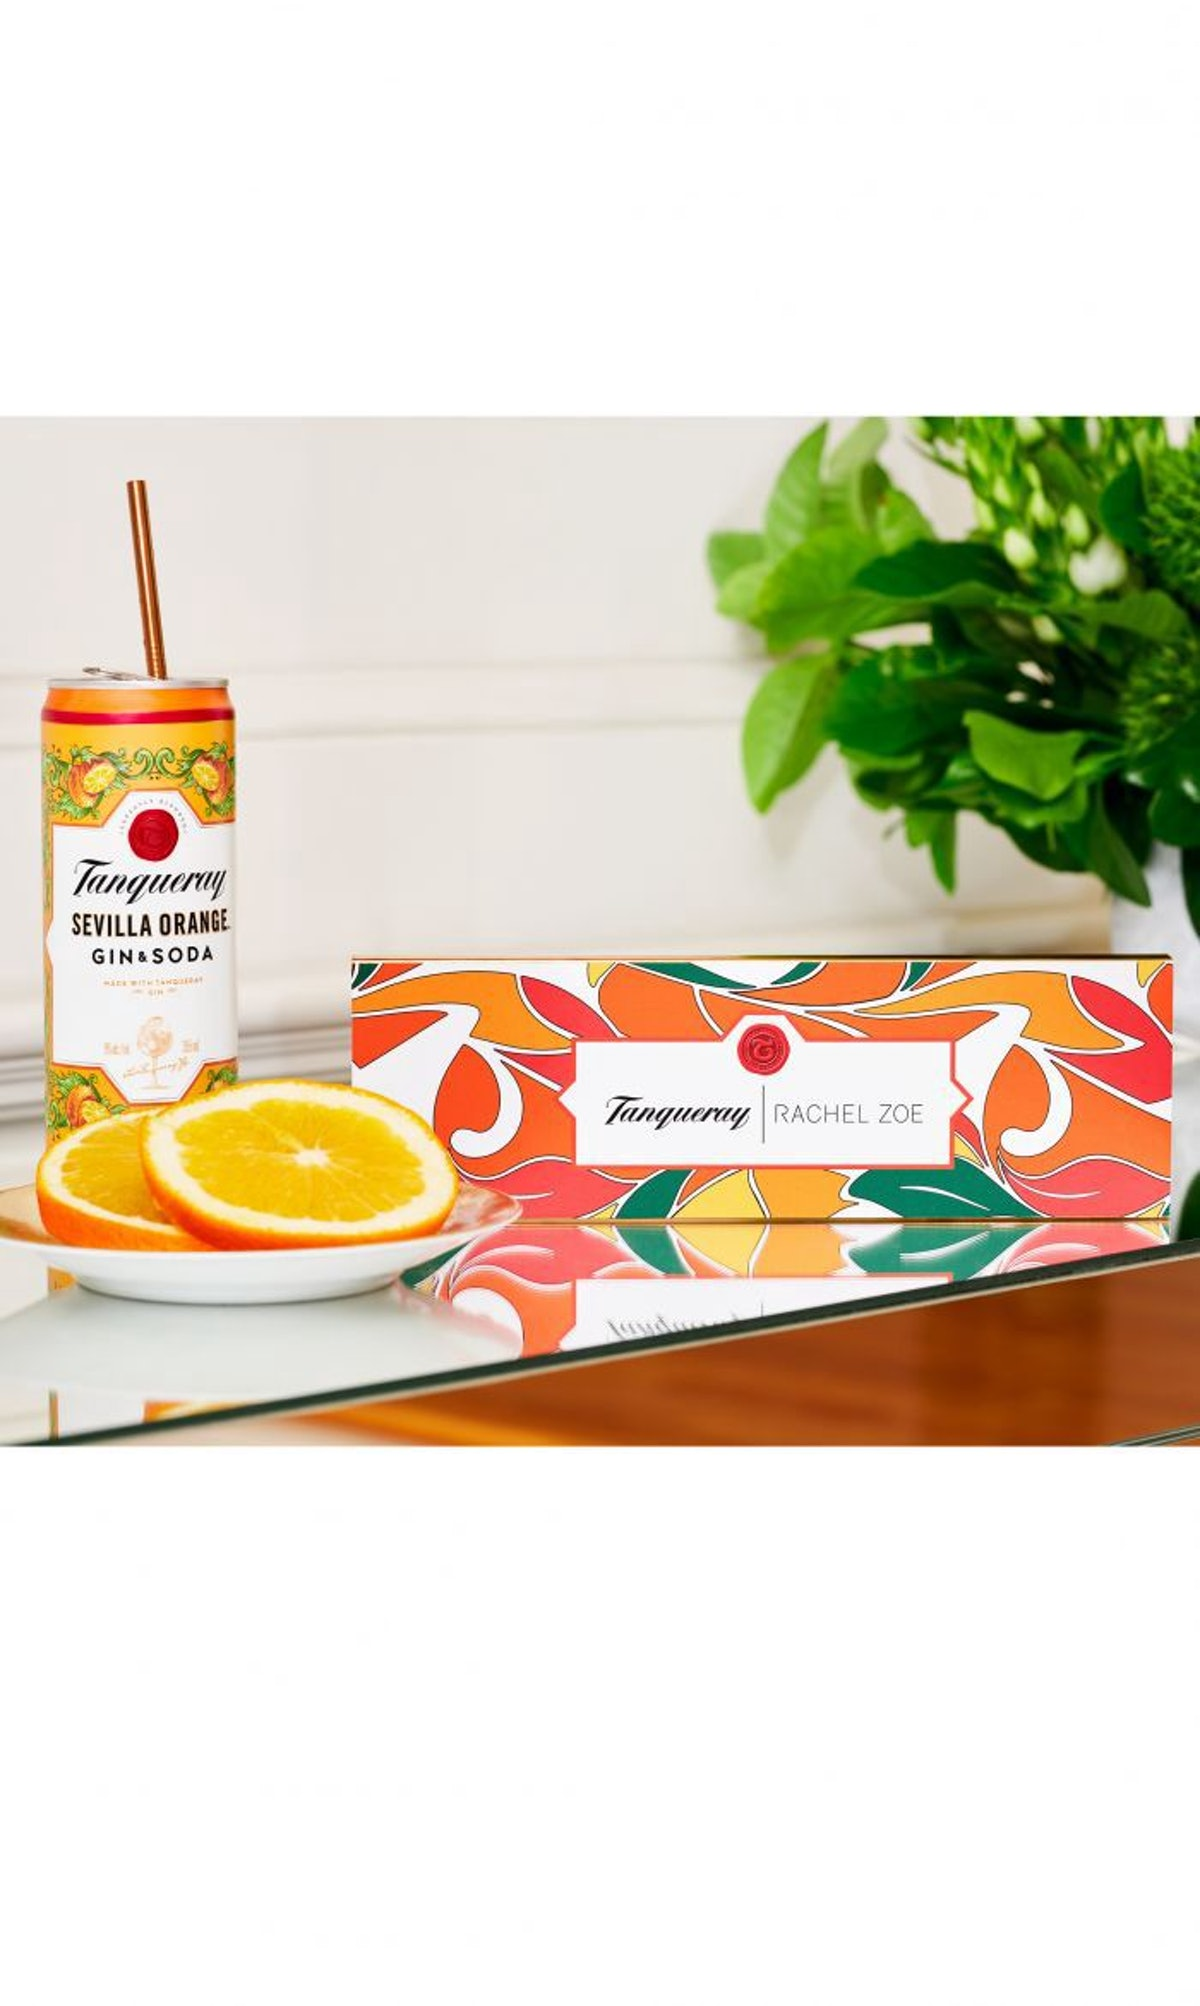 Rachel Zoe x Tanqueray Straw Capsule Collection: image 1